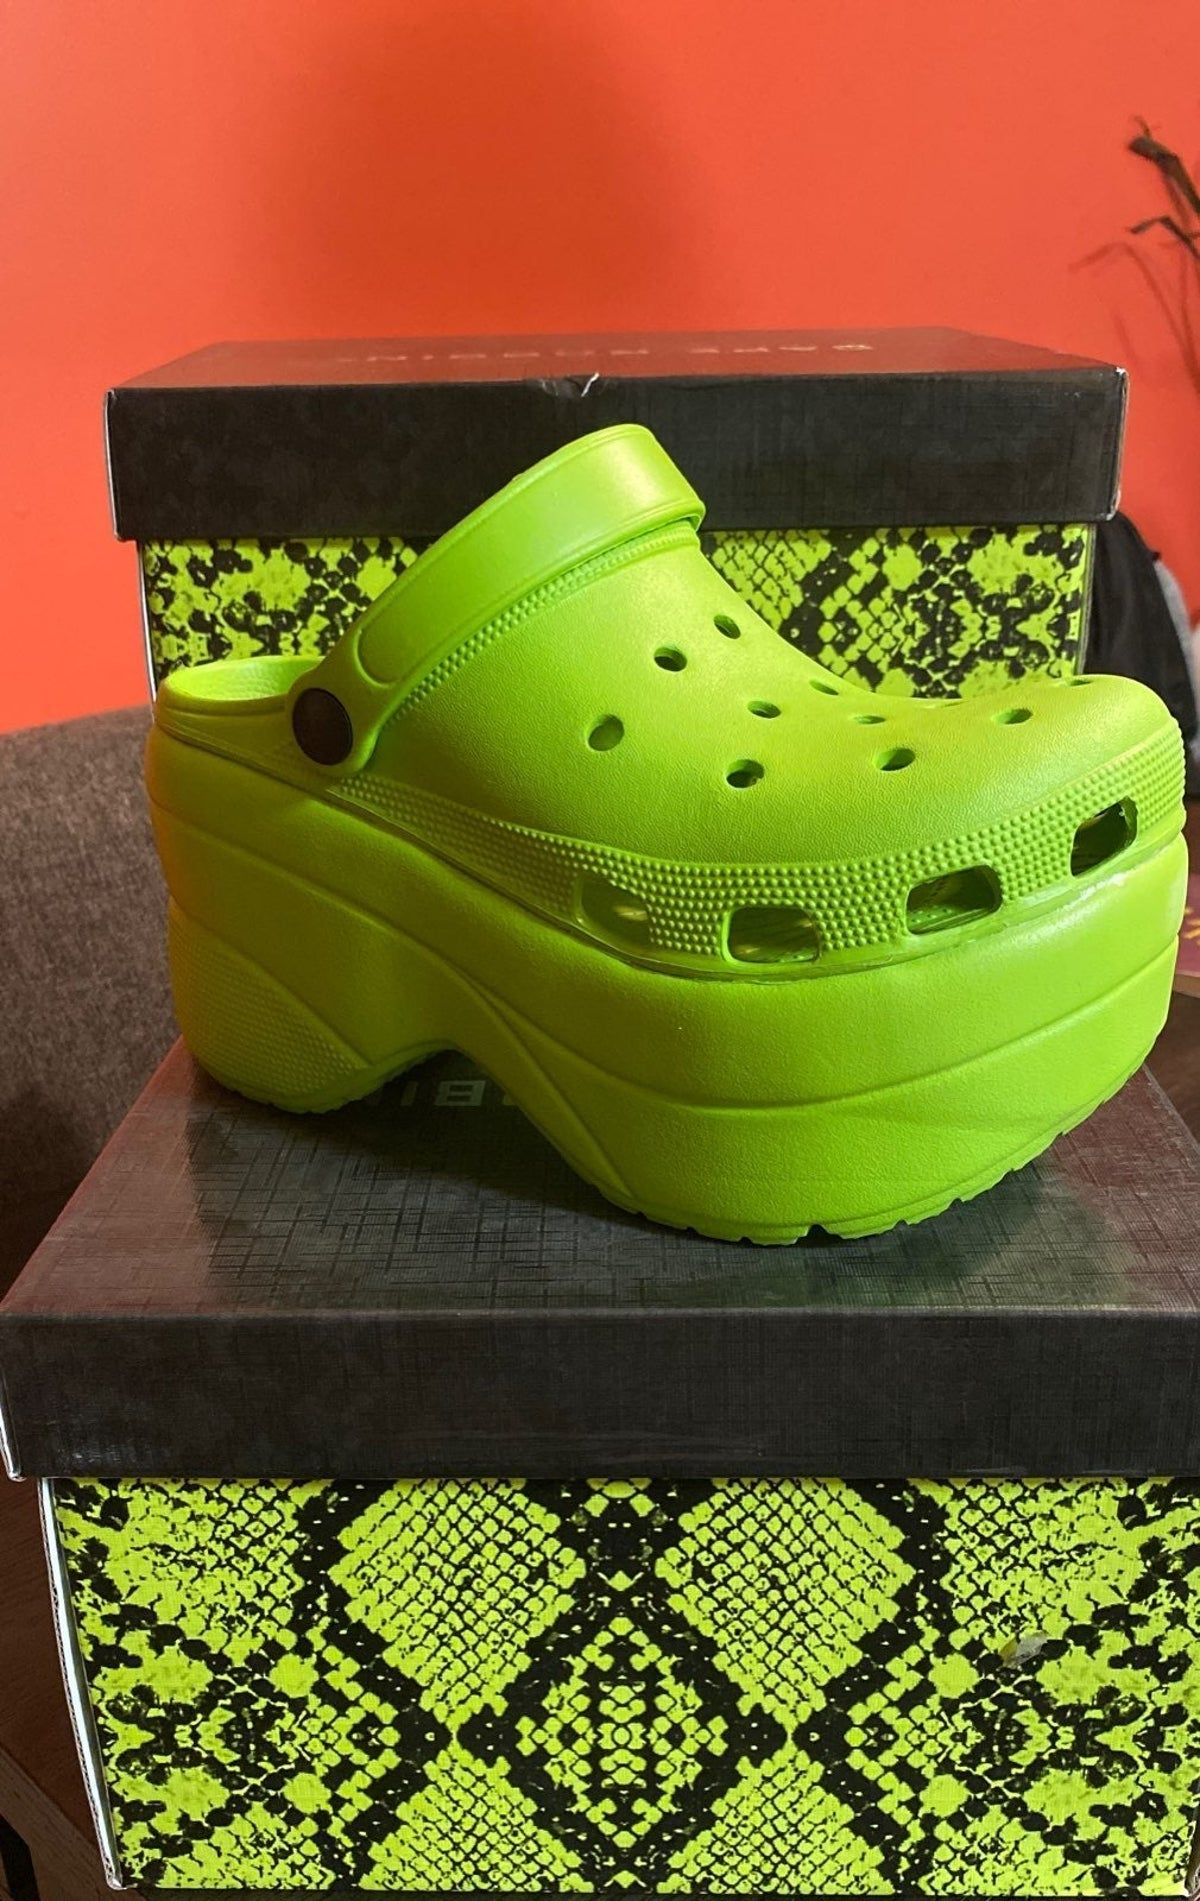 Platform crocs, Platform clogs